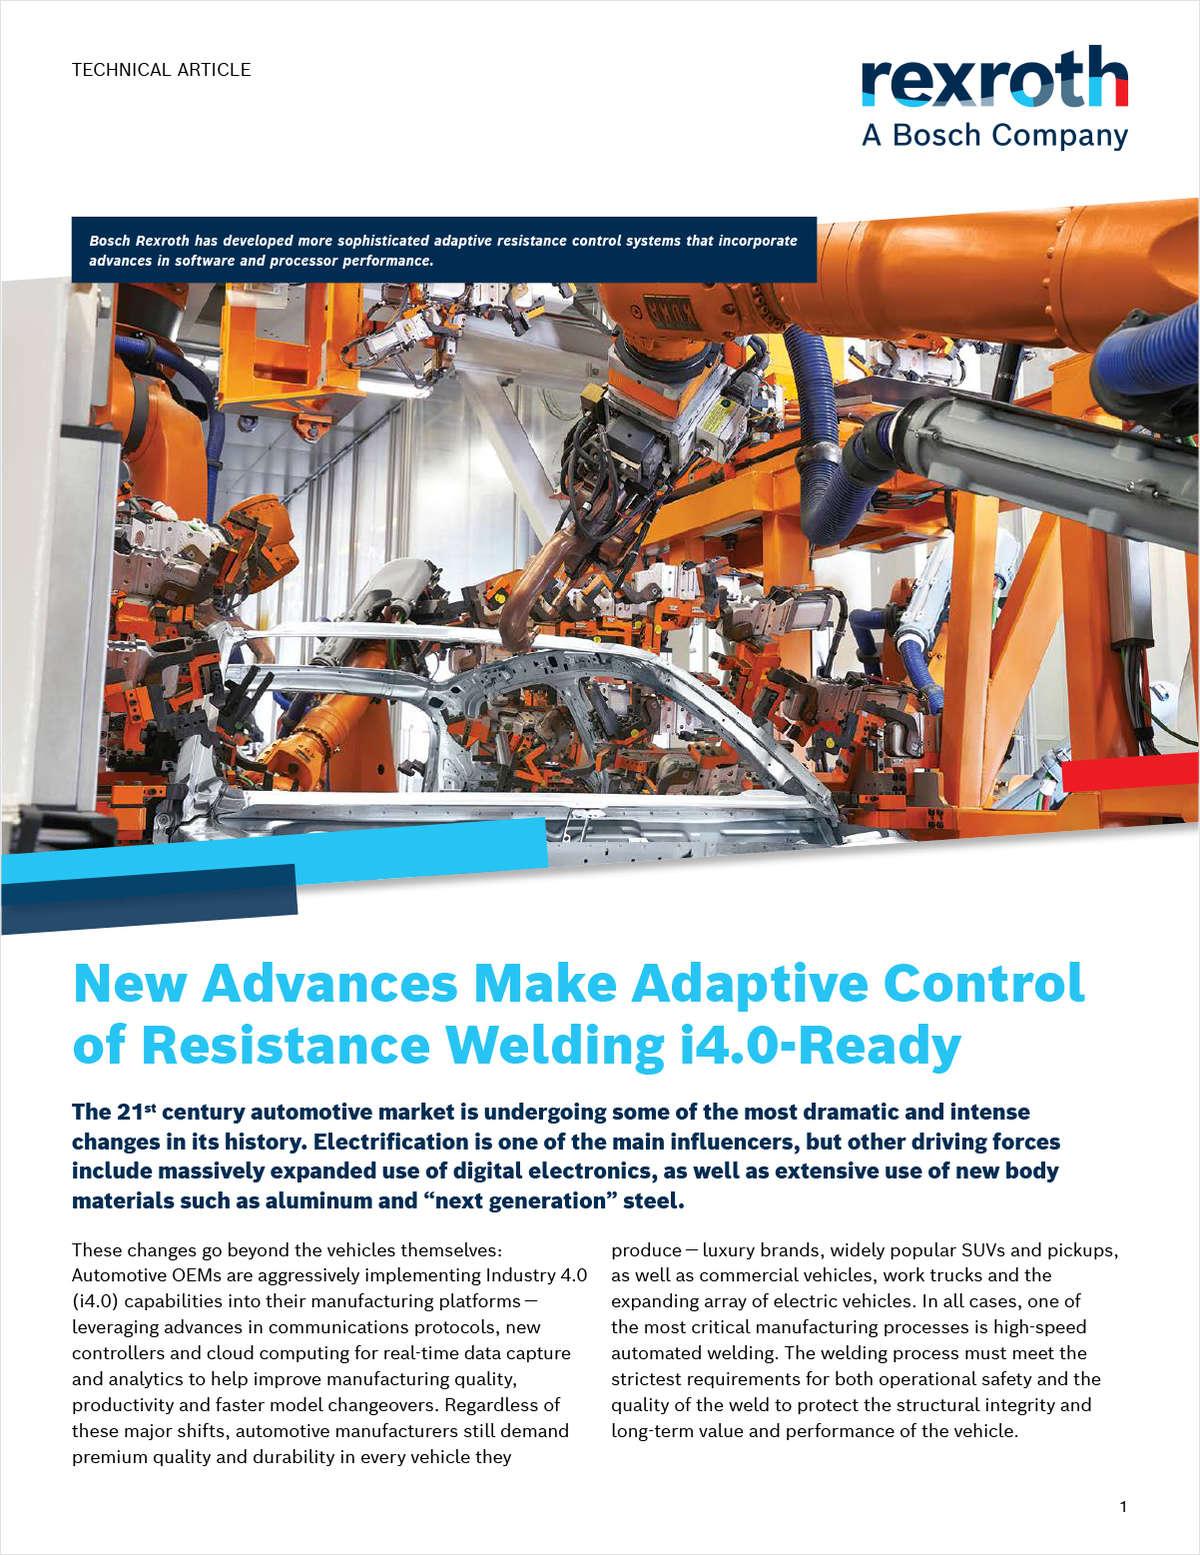 New Advances Make Adaptive Control of Resistance Welding i4.0-Ready